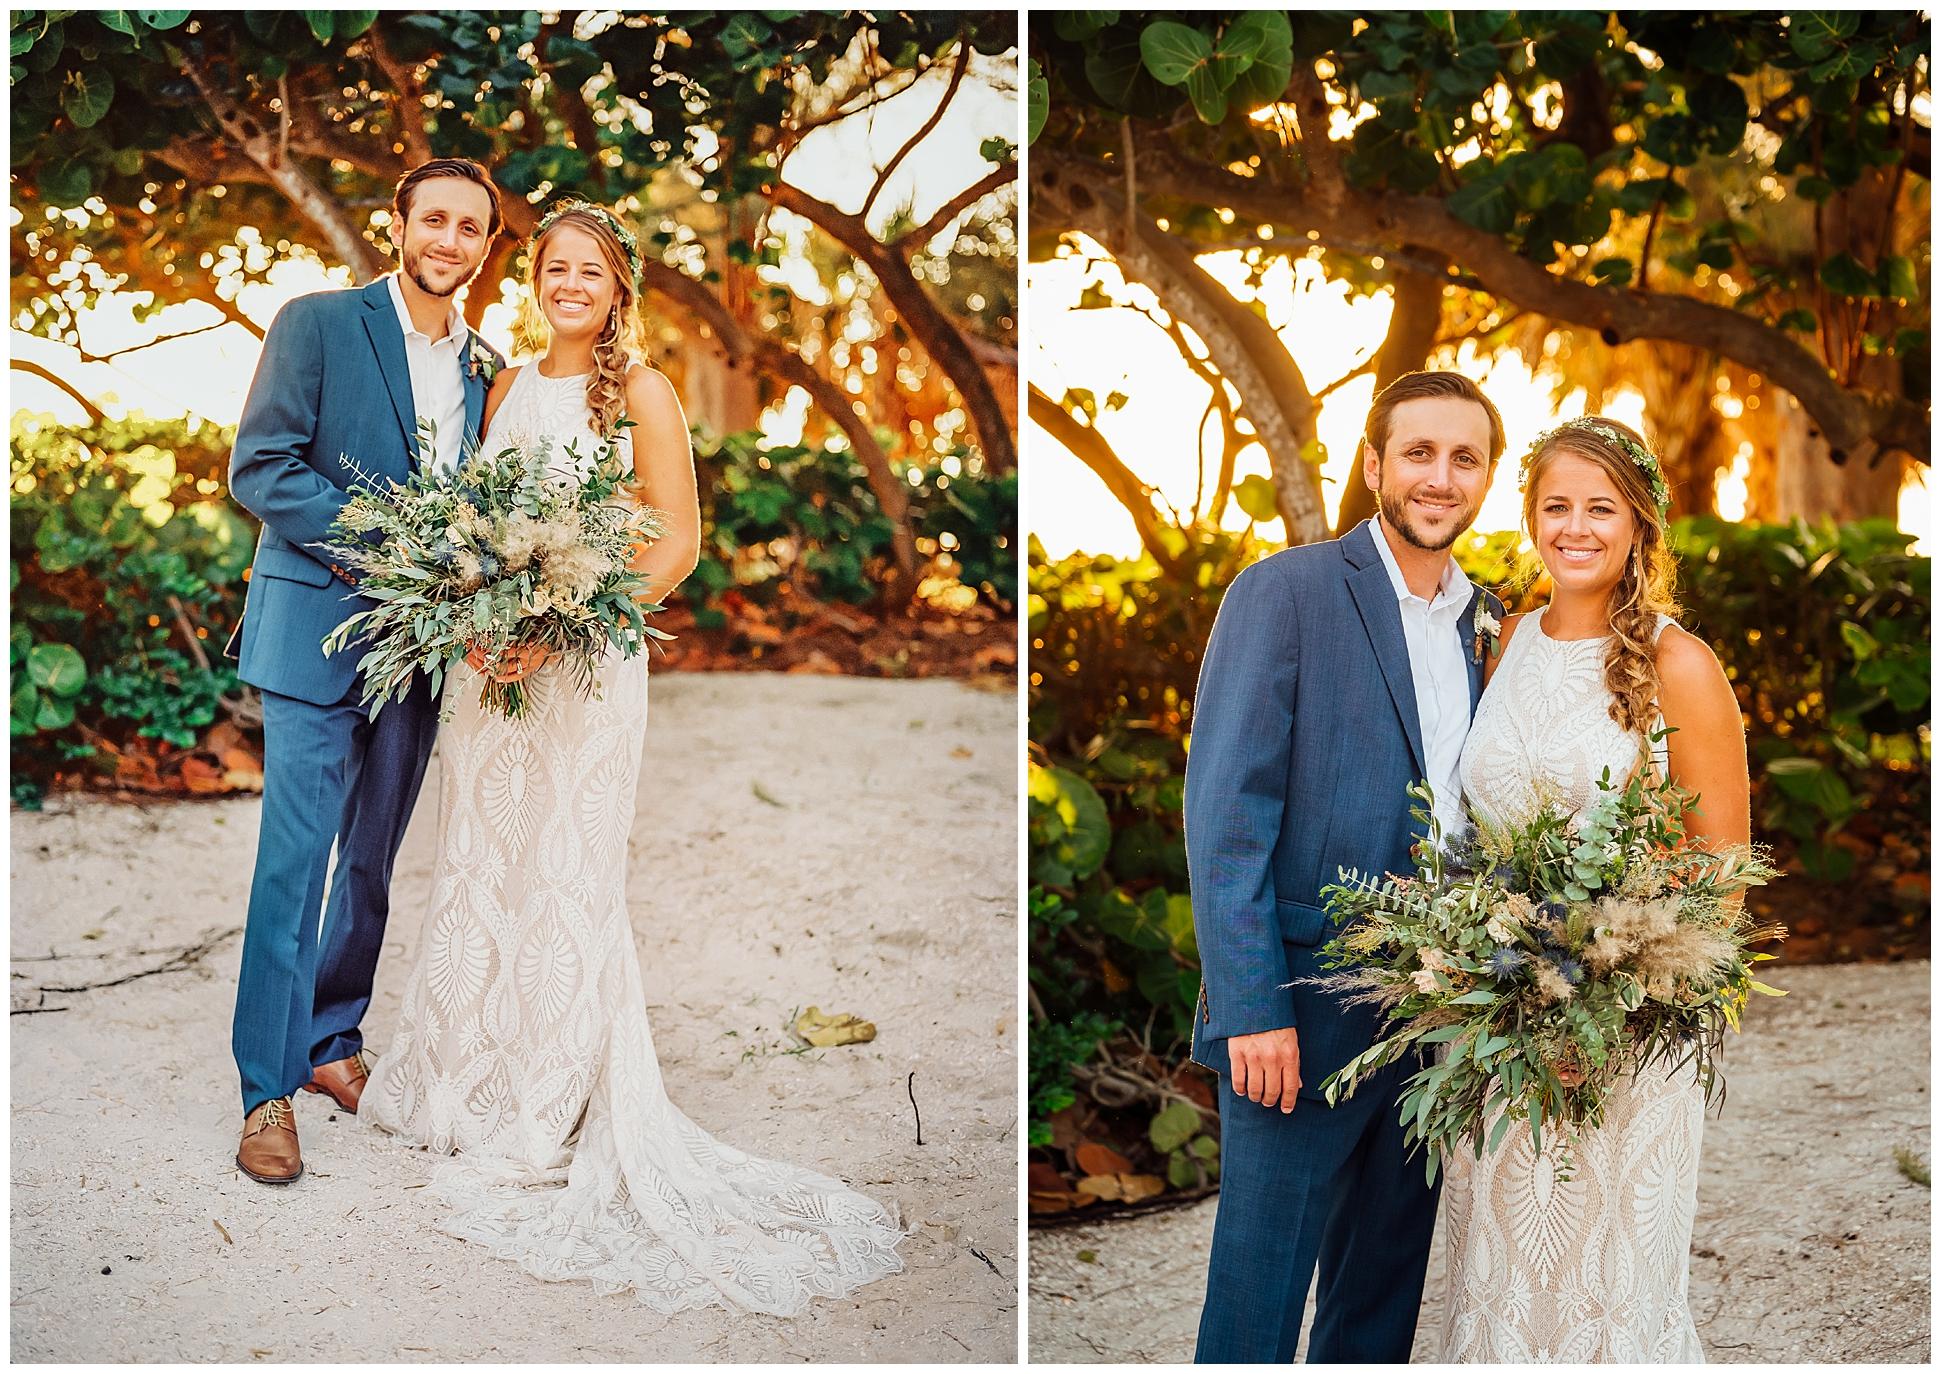 medium-format-film-vs-digital-wedding-photography-florida-beach_0017.jpg